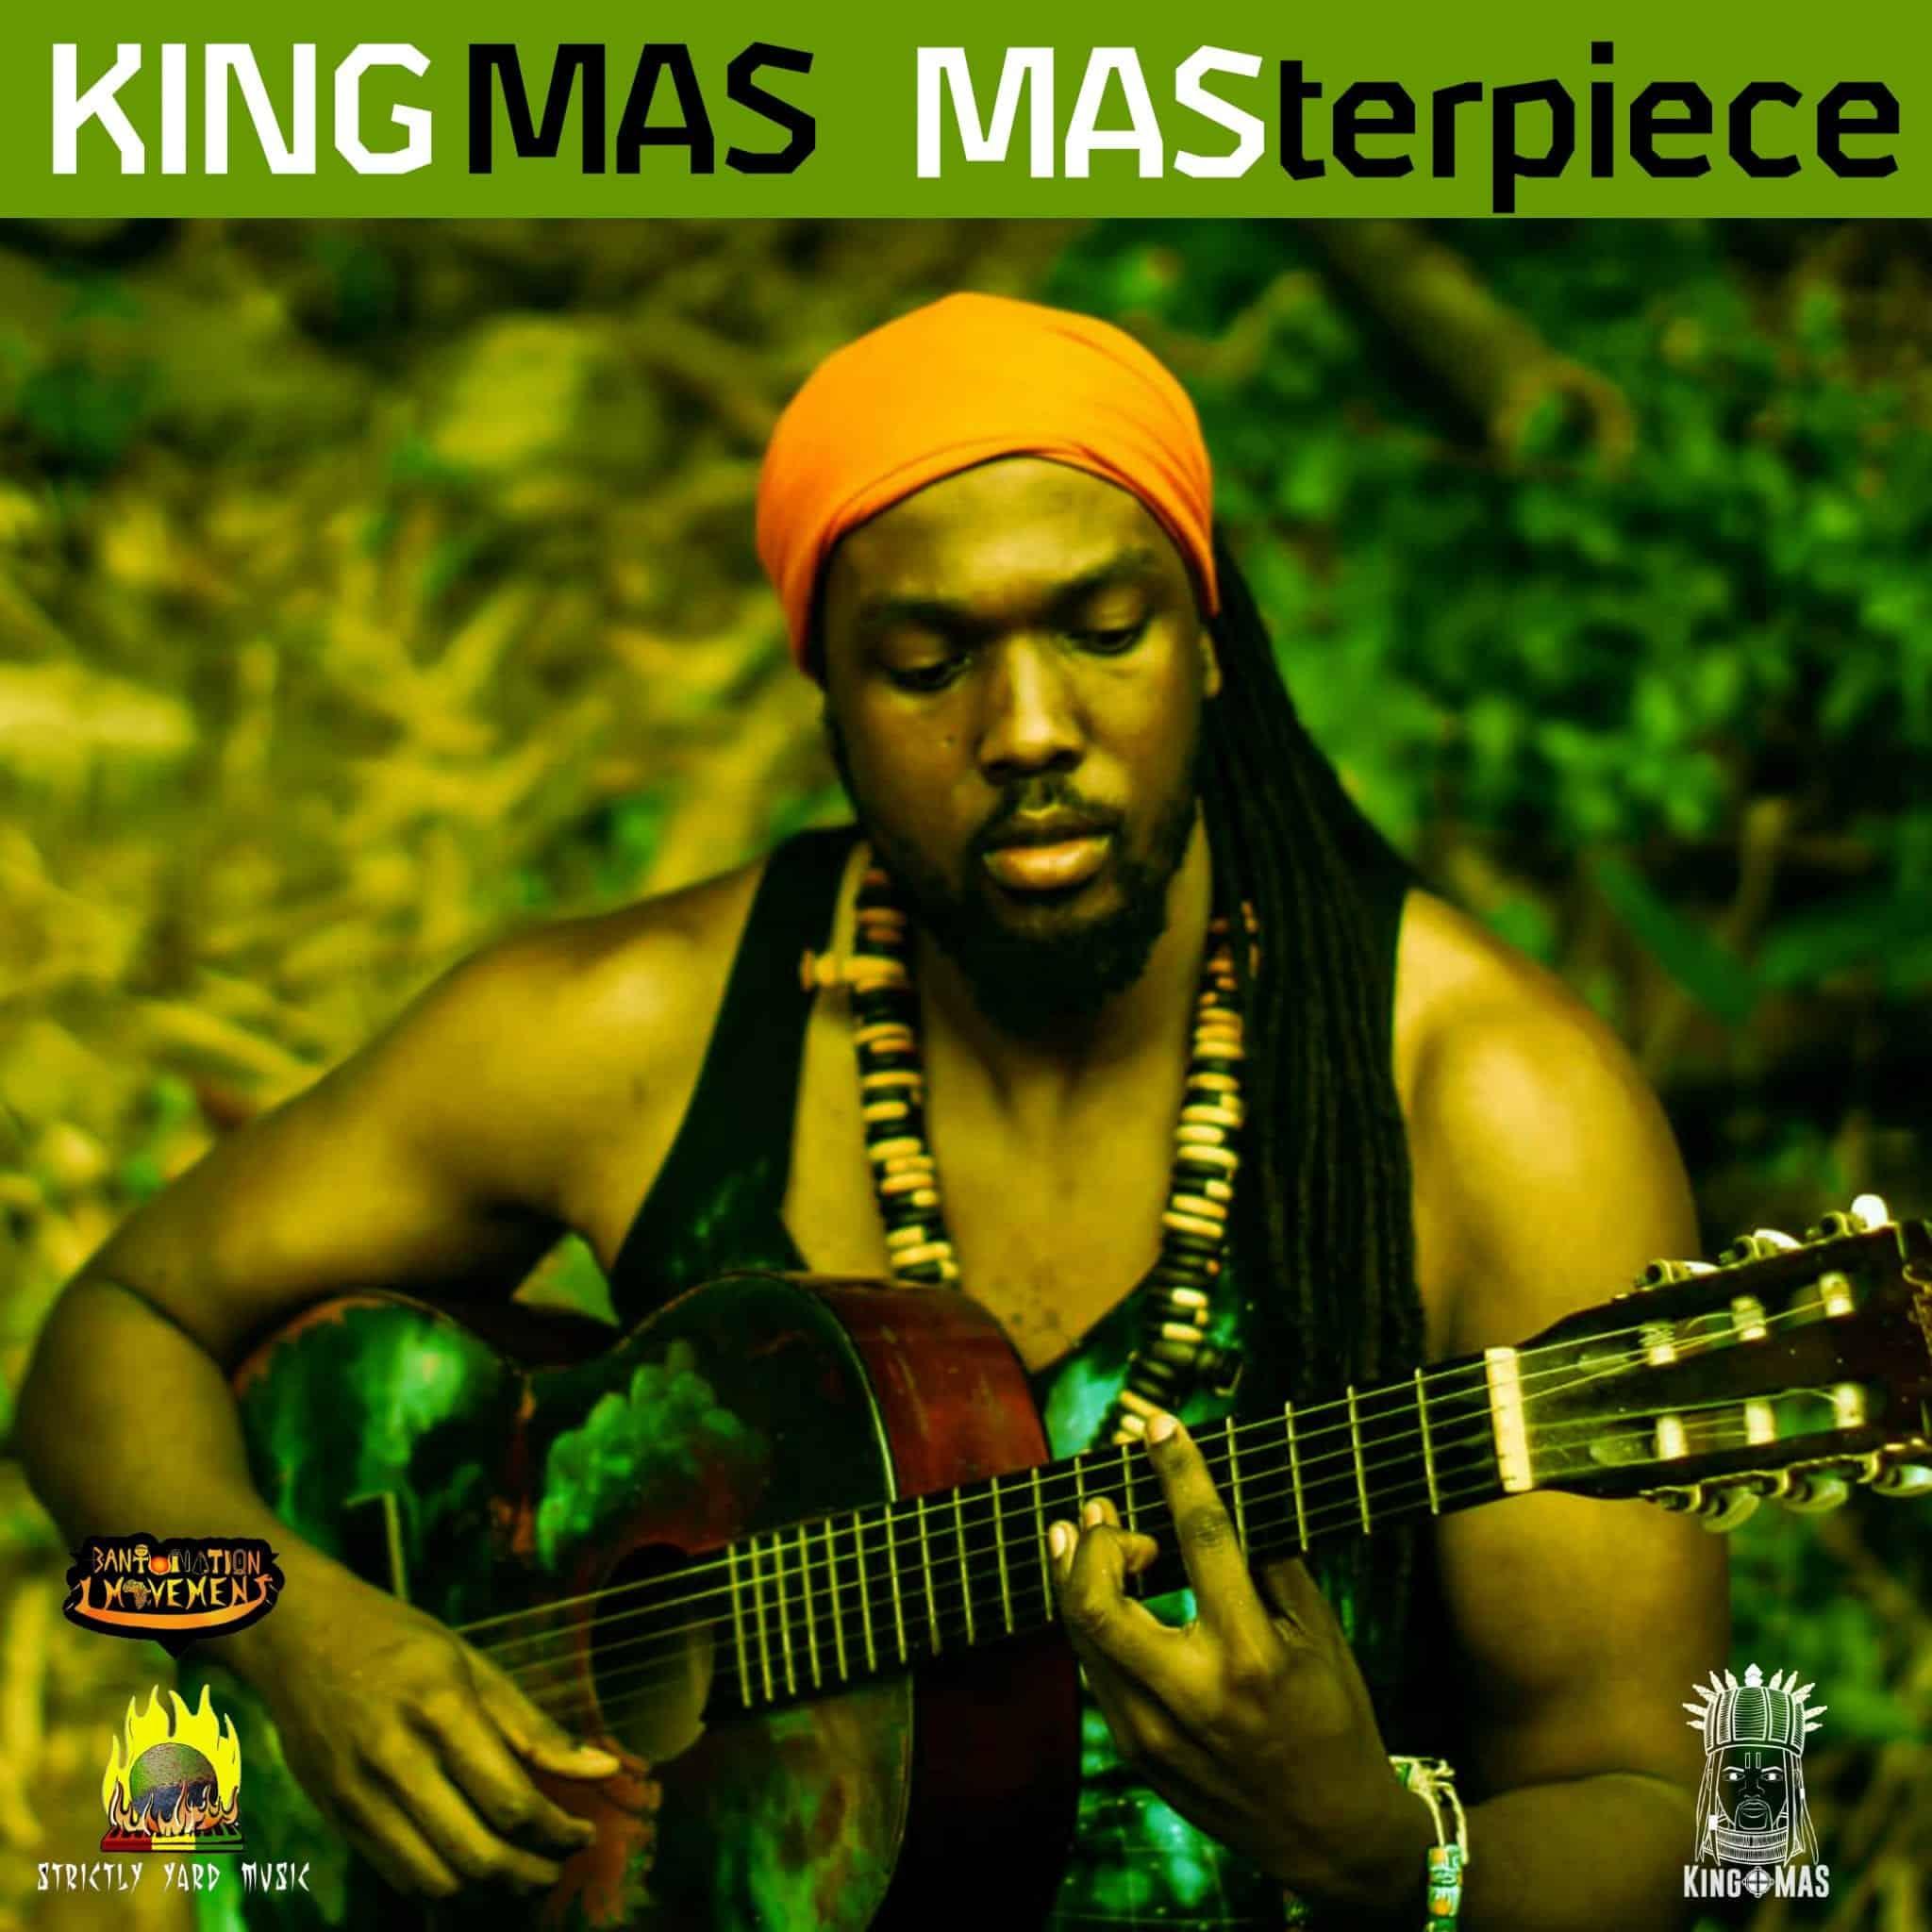 King MAS - MASterpiece - Strictly Yard Music